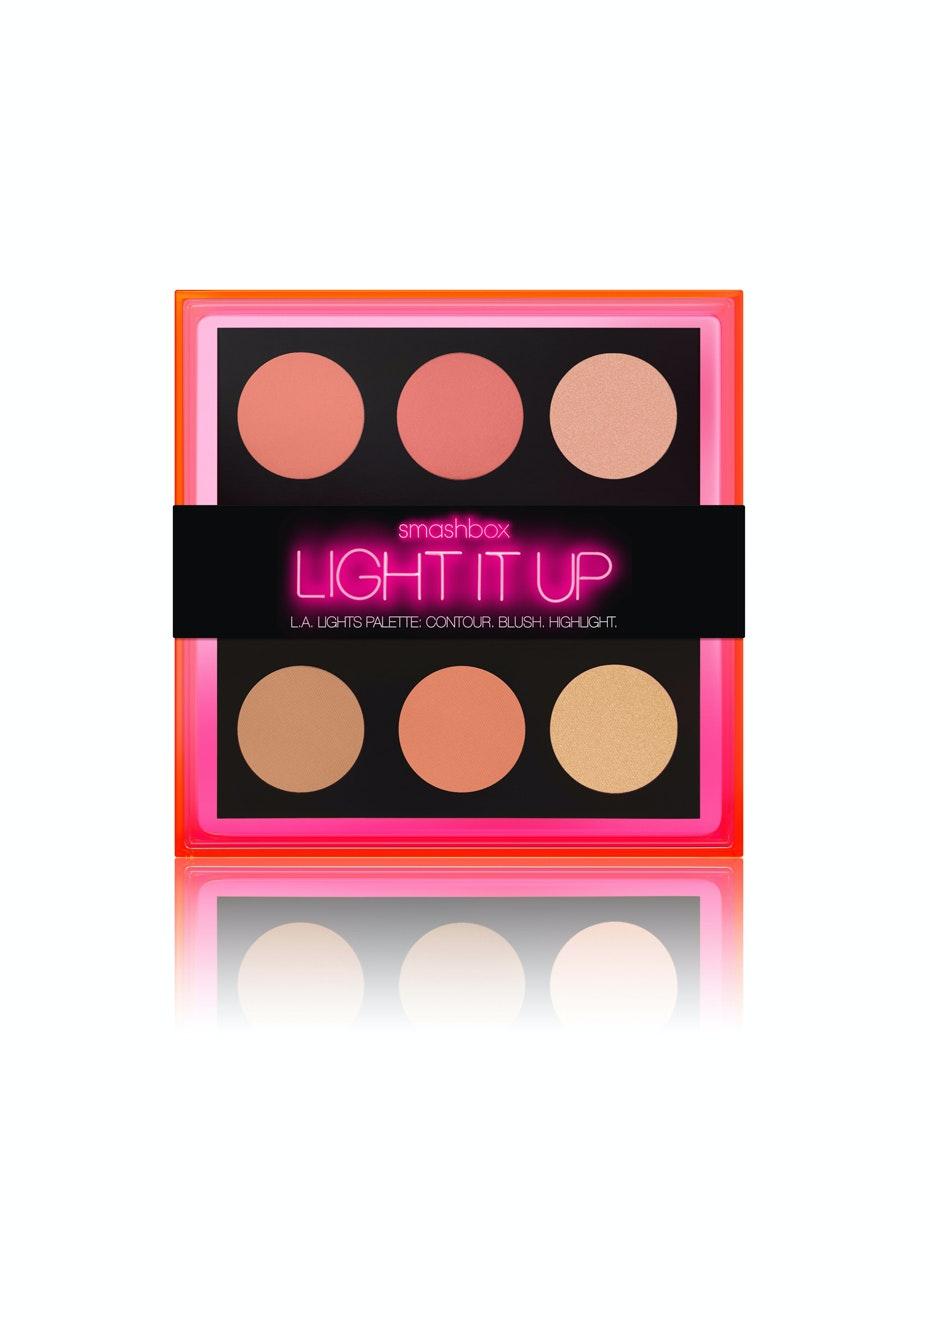 Smashbox - Light It Up L.A. Lights Palette Contour.Blush.Highlight. Set